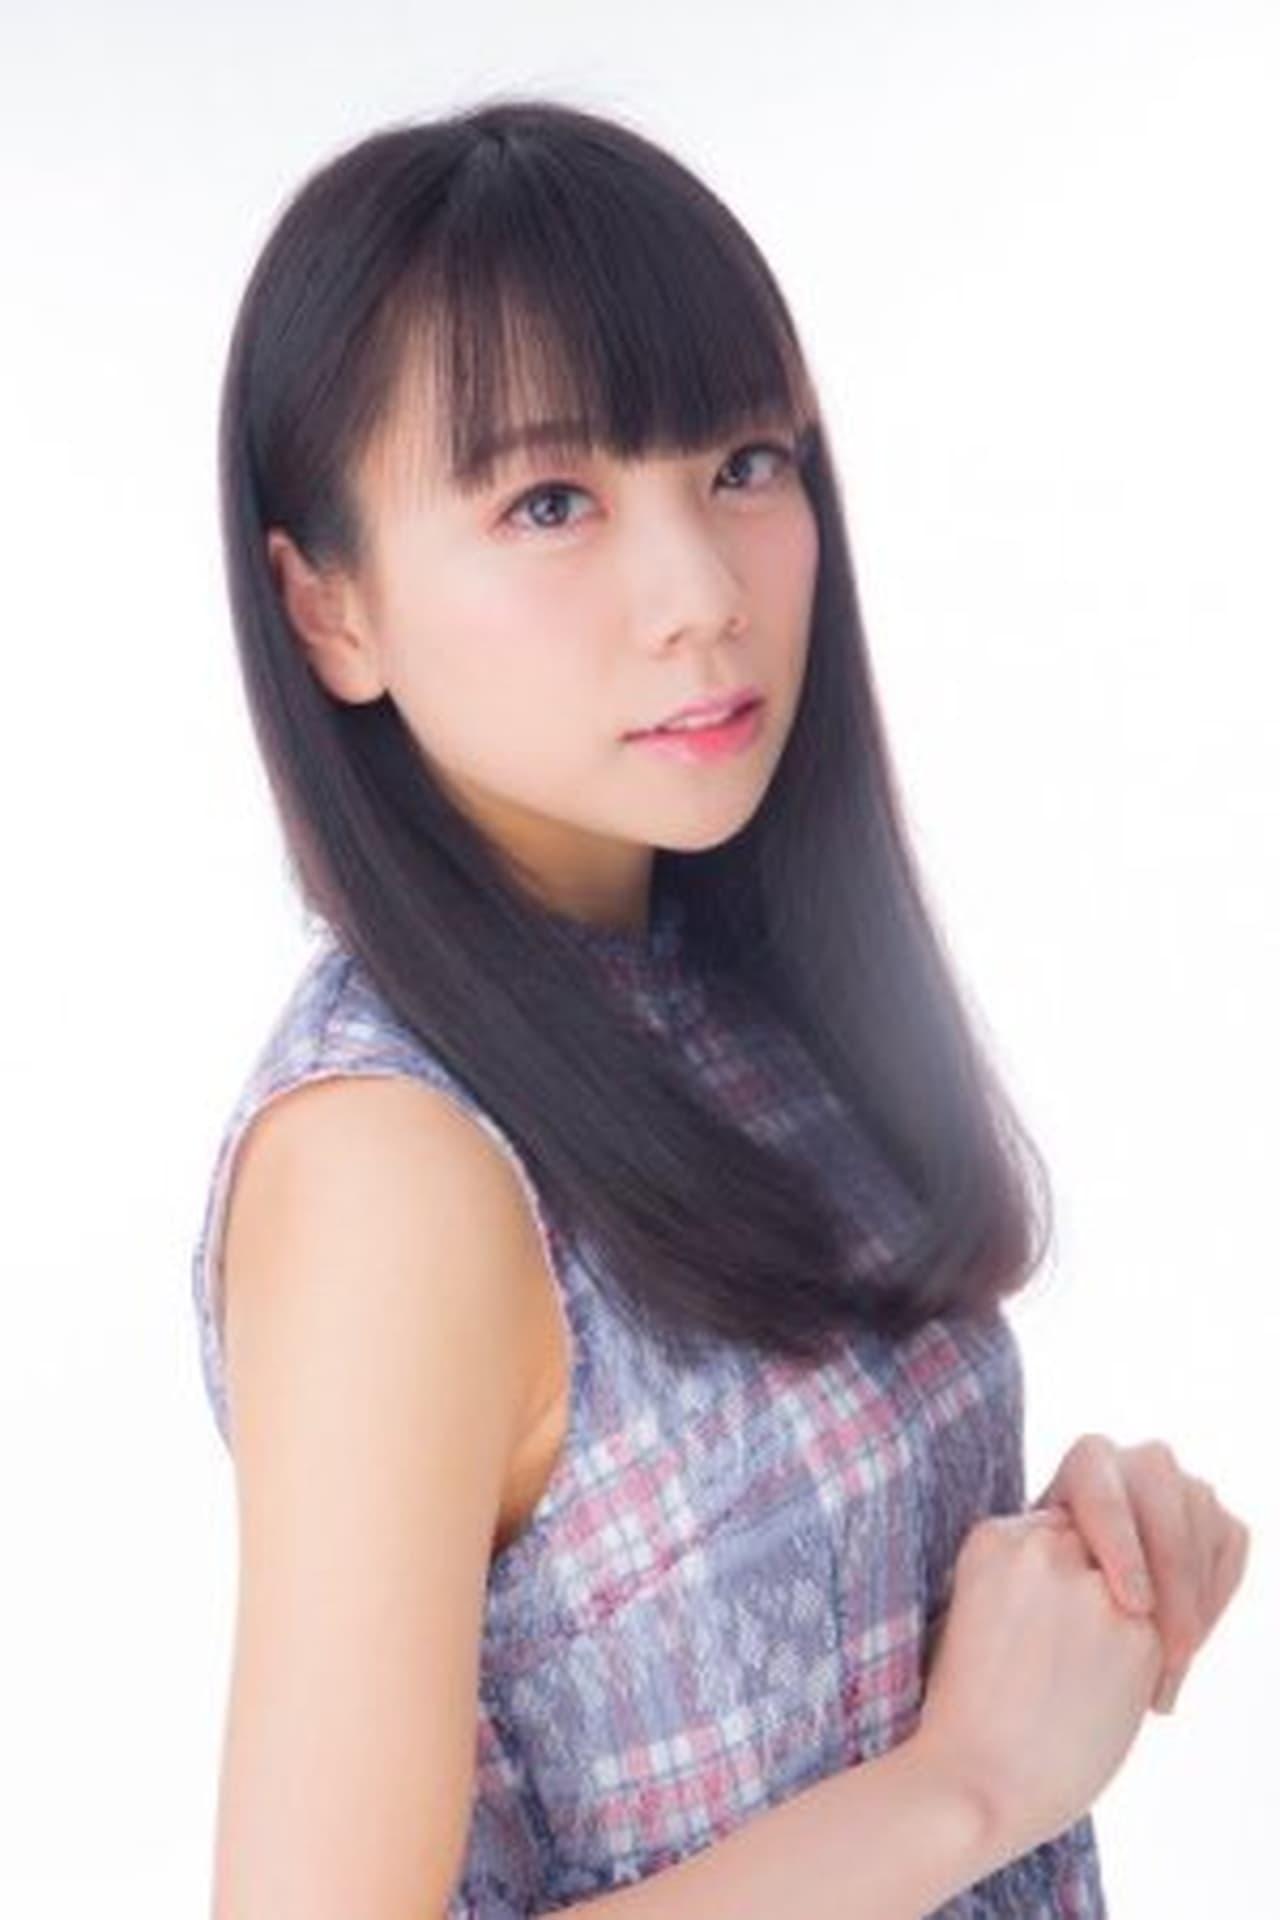 Chiyuki Miura